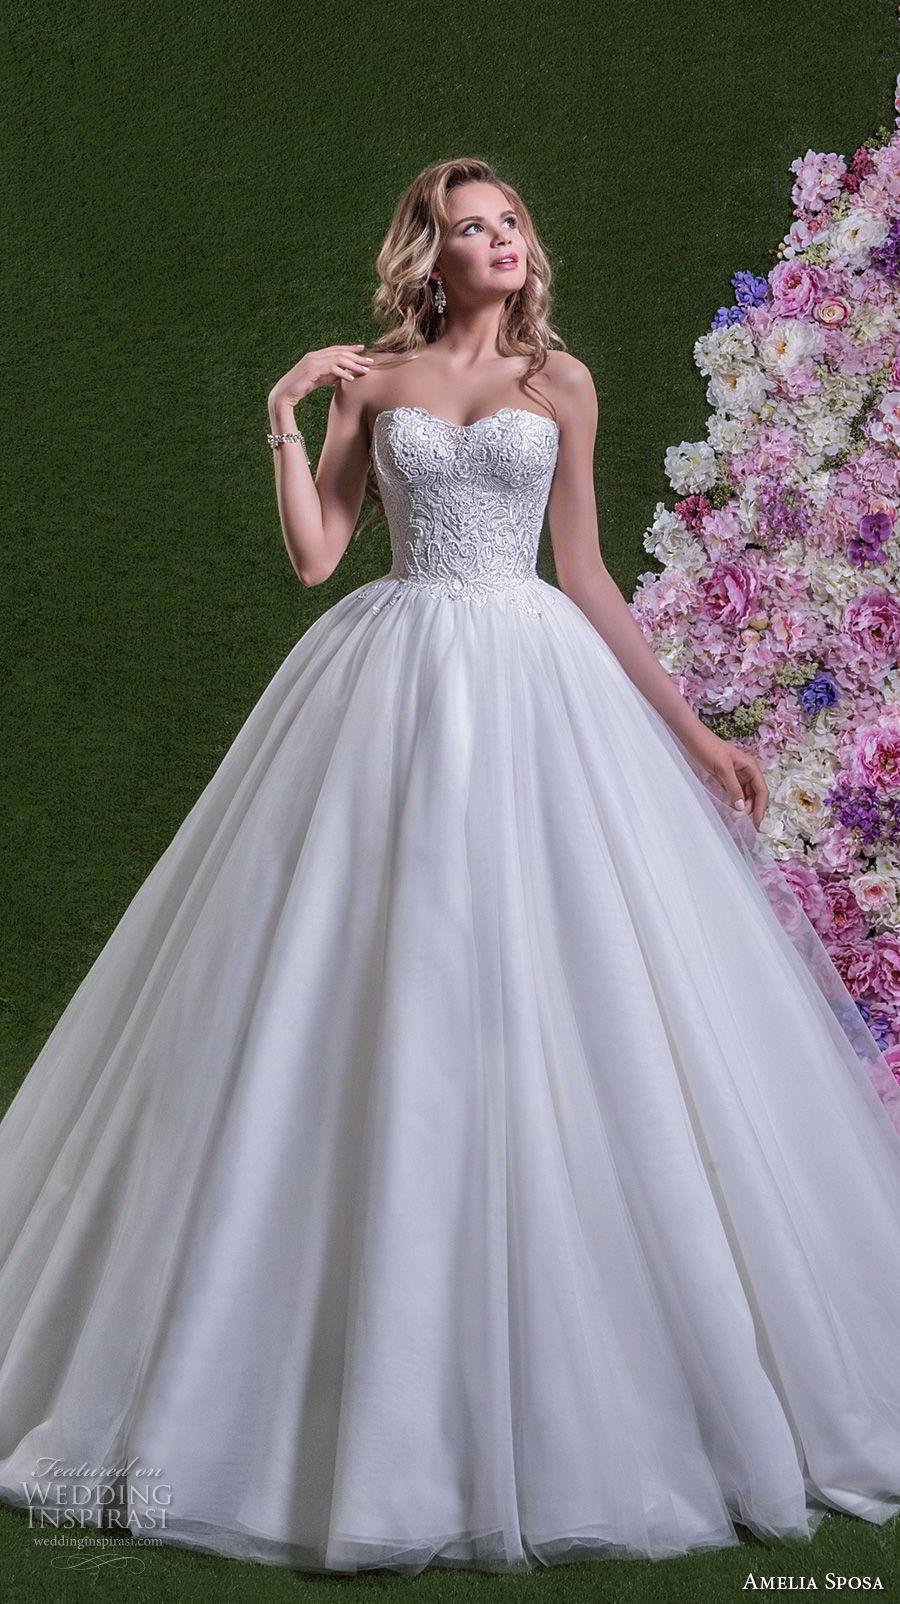 where to buy amelia sposa wedding dresses photo - 1